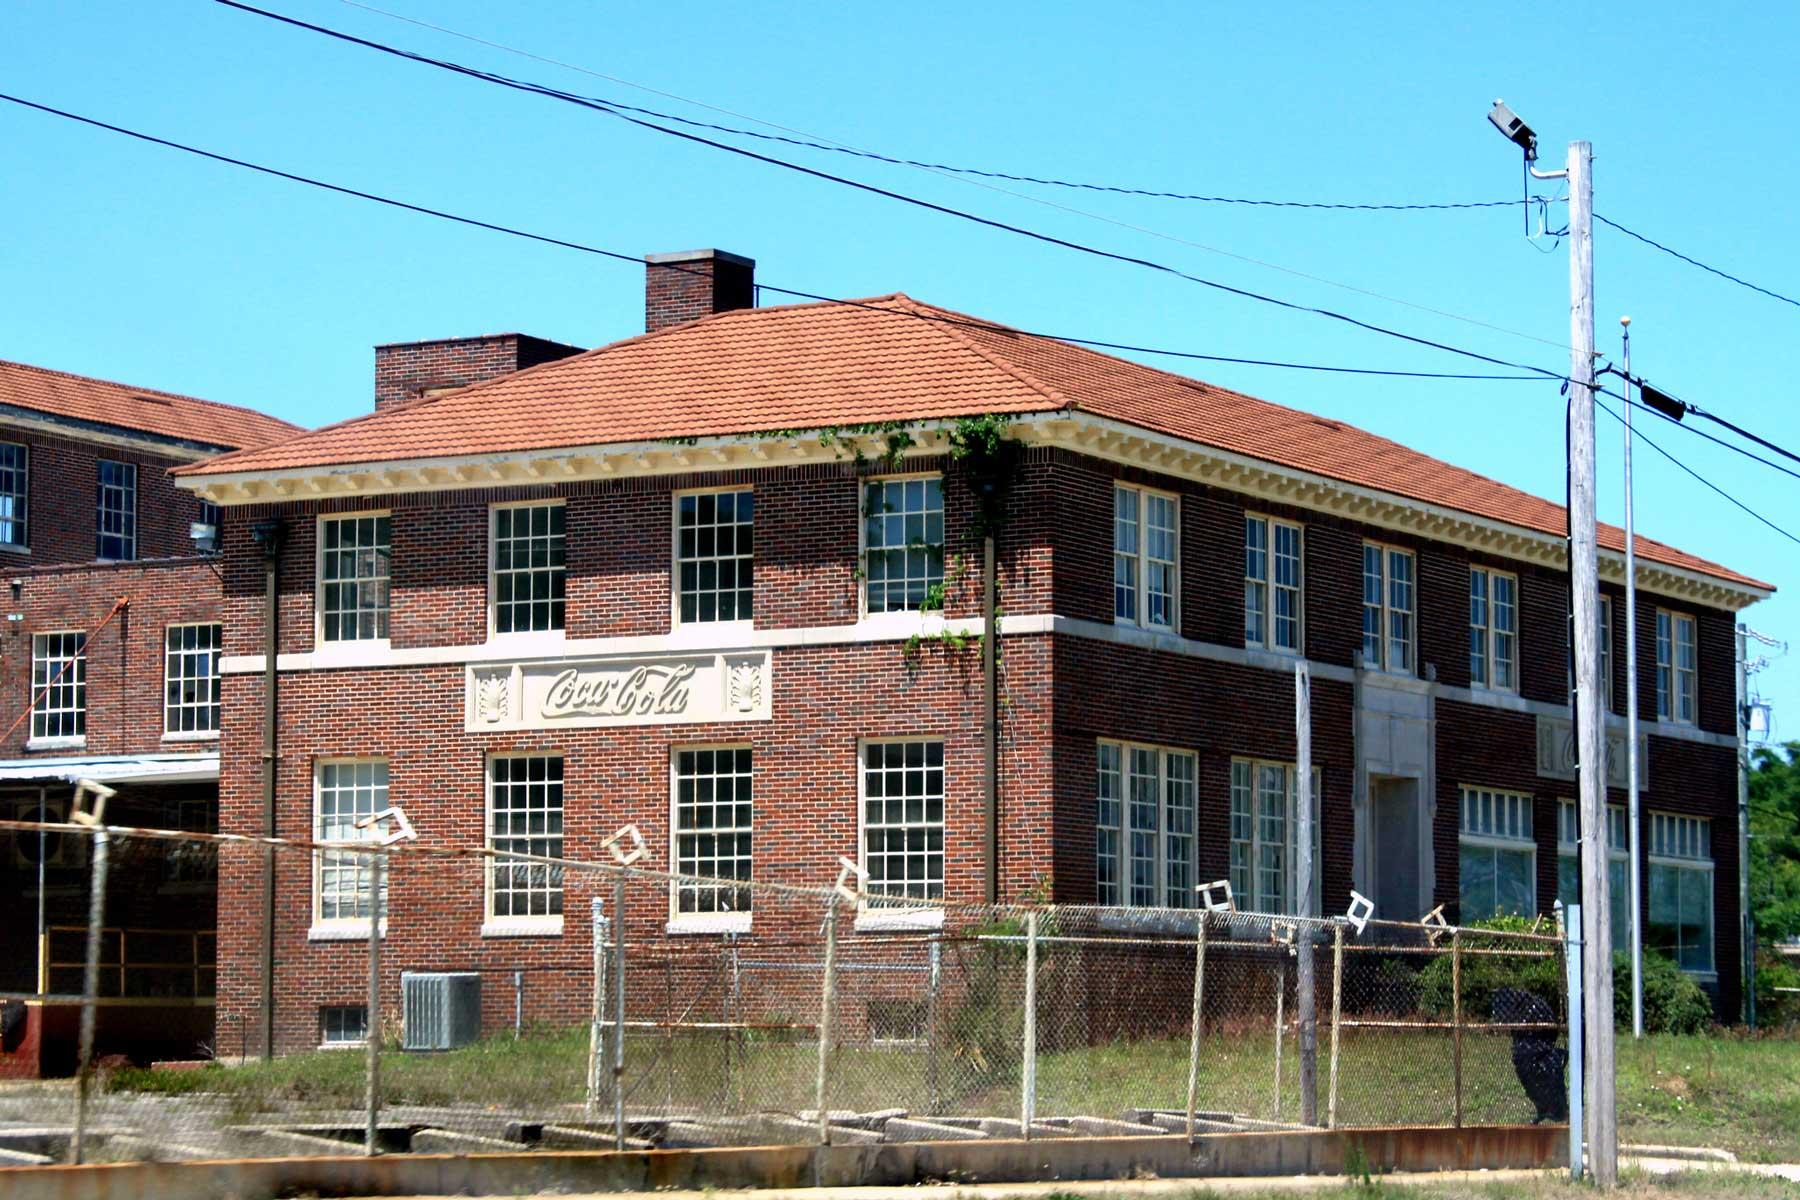 #6 - Hygeia Bottling Works1625 North Palafox StreetBuilt 1936